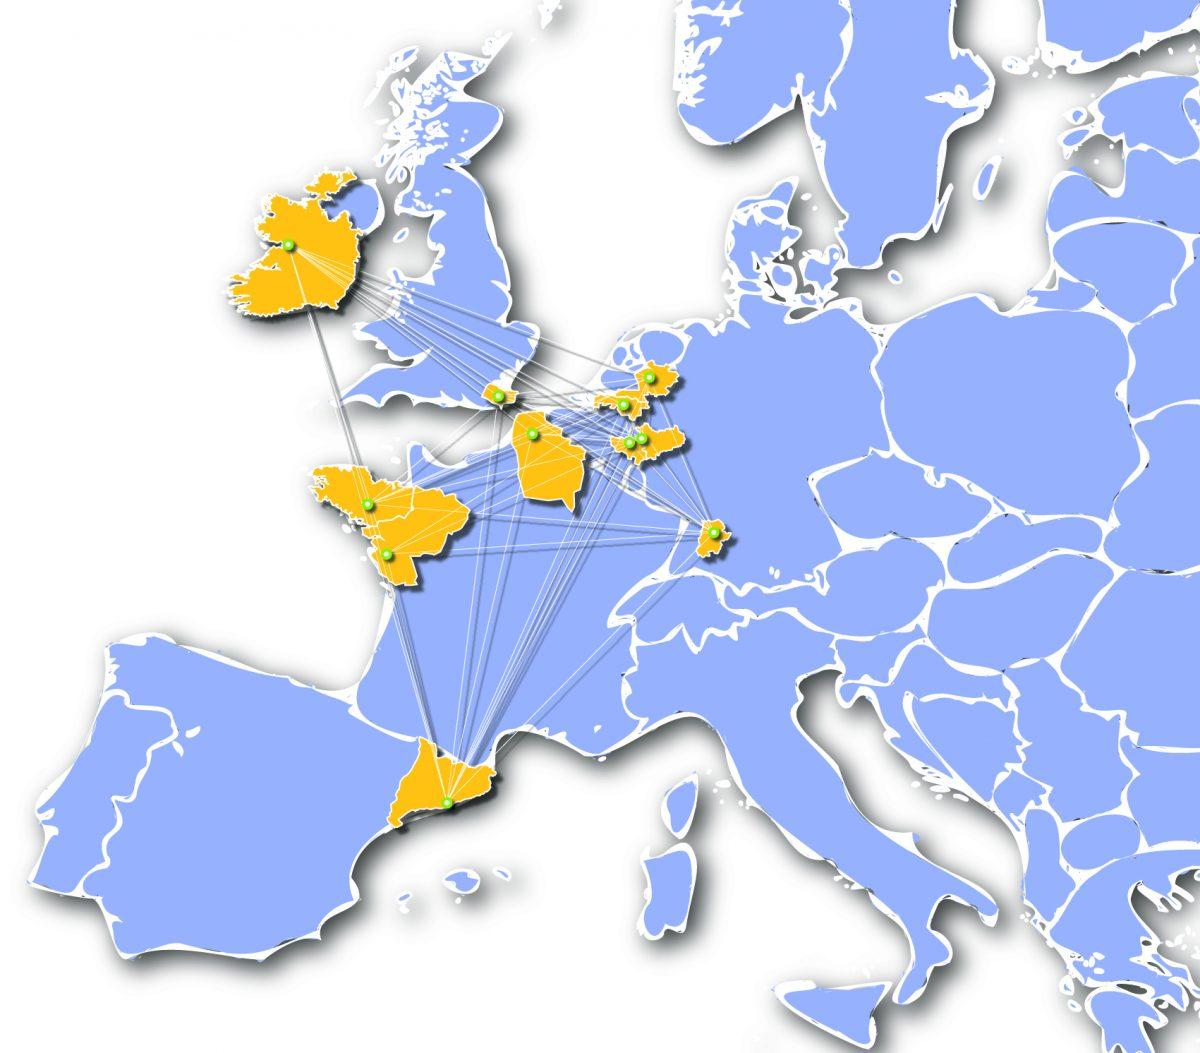 Boost4Health Regions Map